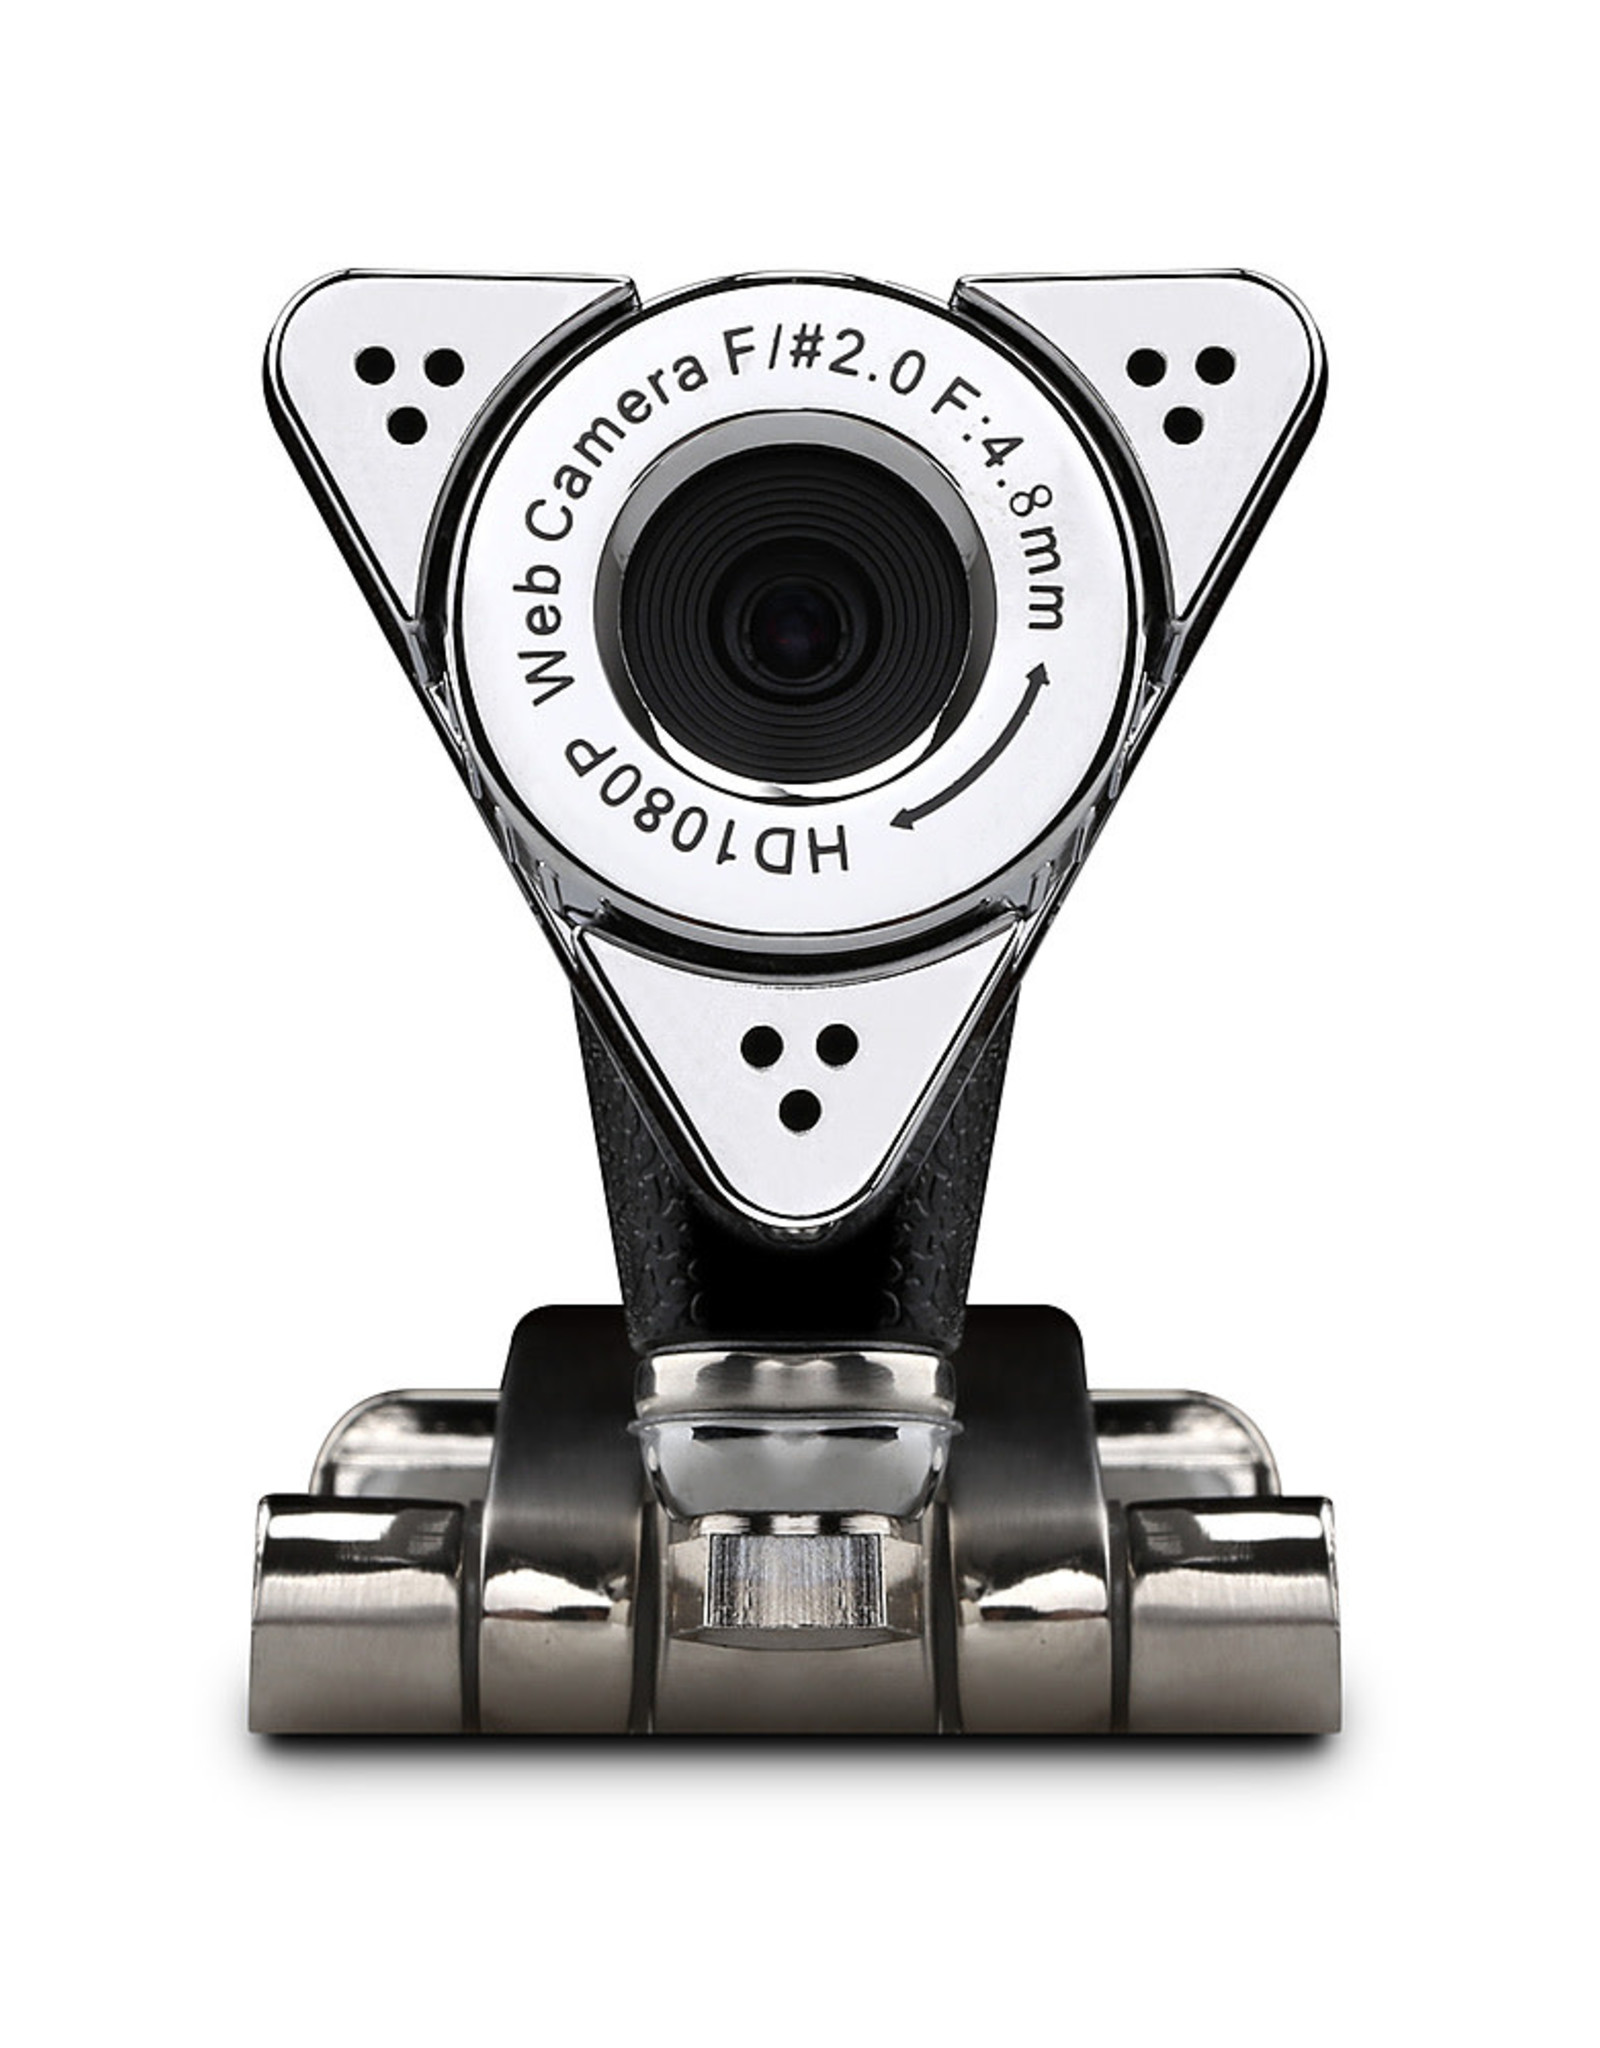 Aluratek    HD 1080P Webcam for Desktop/Laptop With Auto Focus, Built-In Mic, 30fps AWC01F